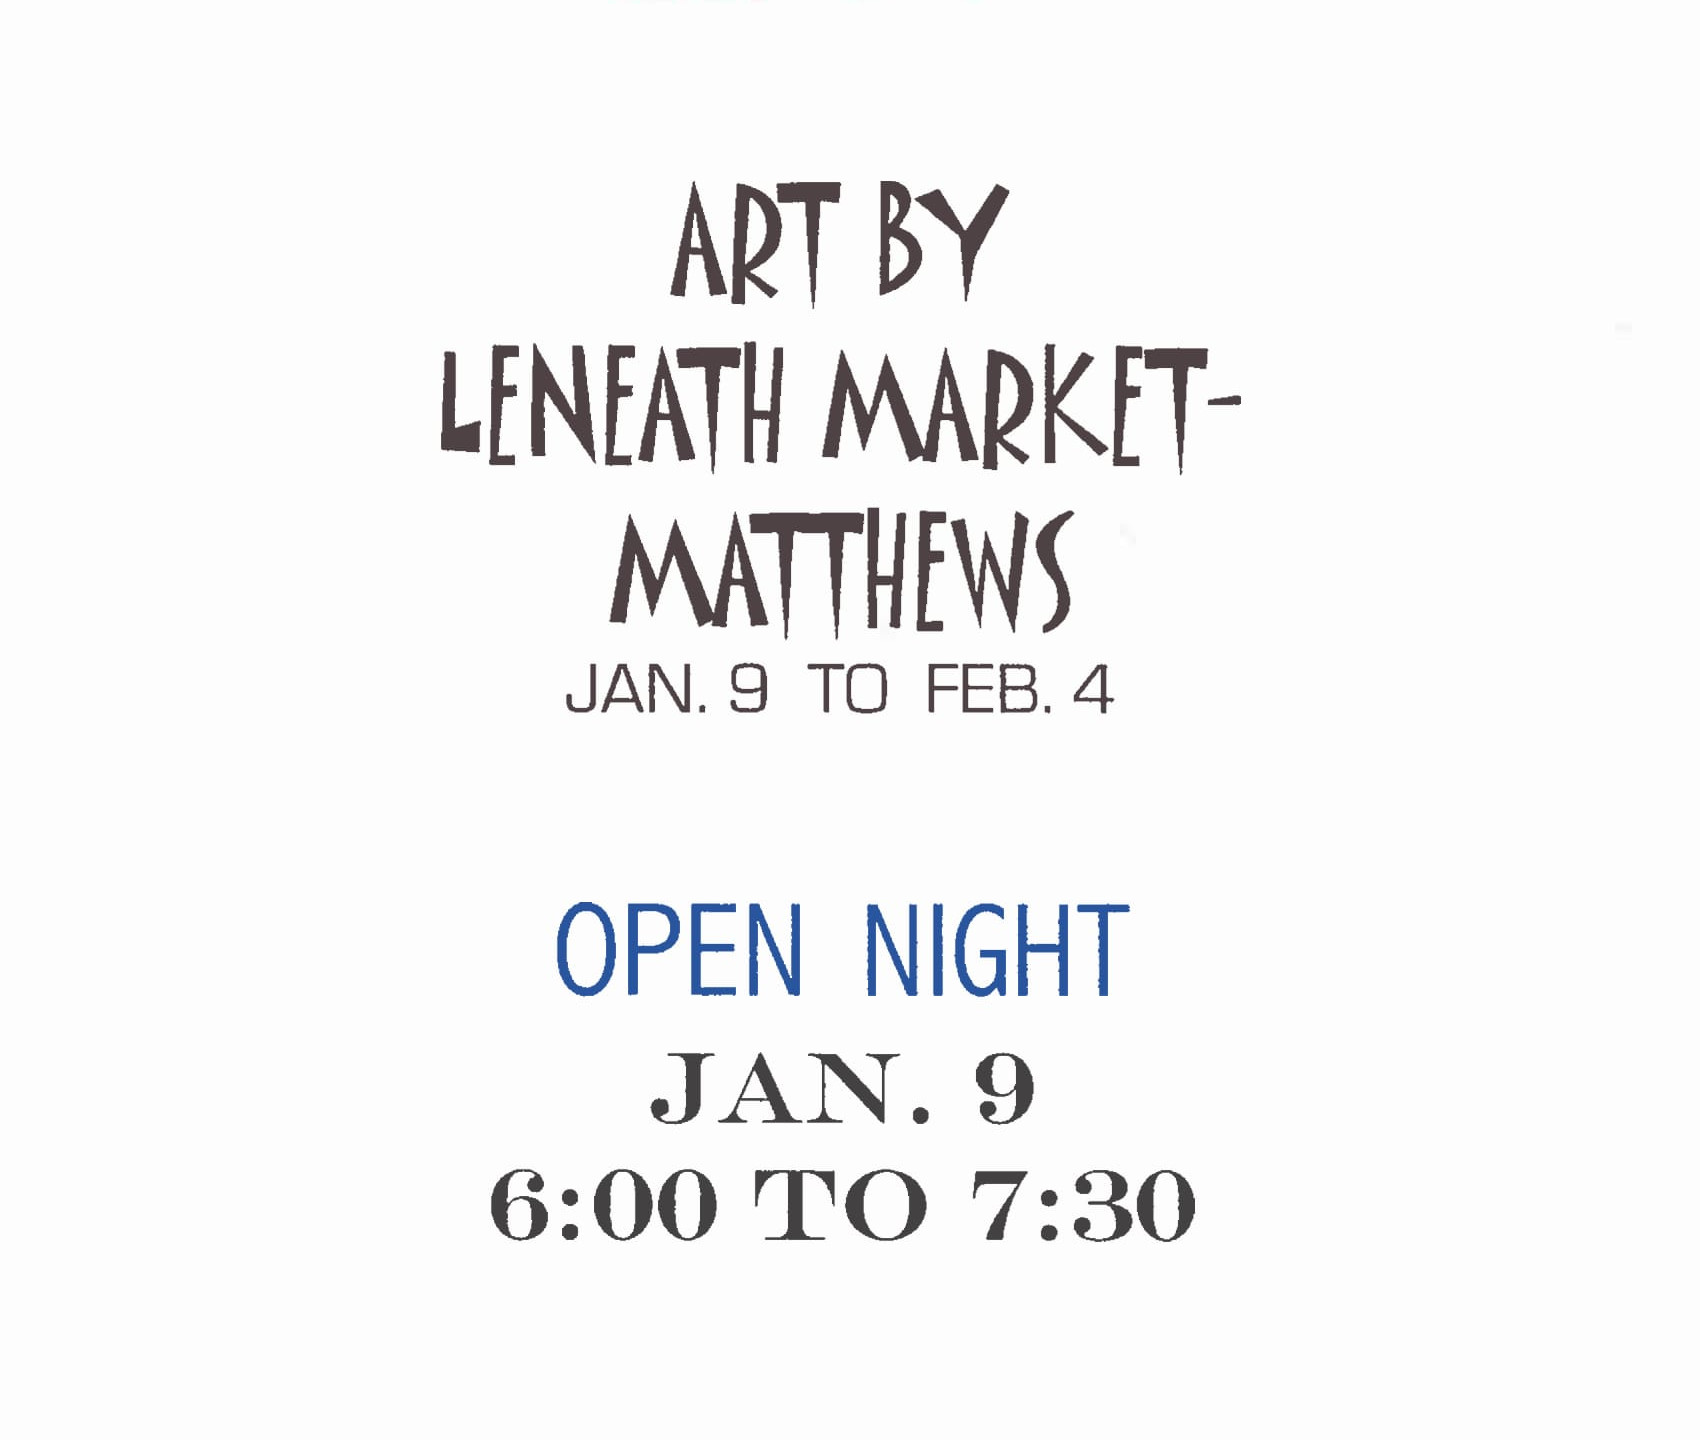 January 2006 - Leaneath Market -Matthews Poster-1